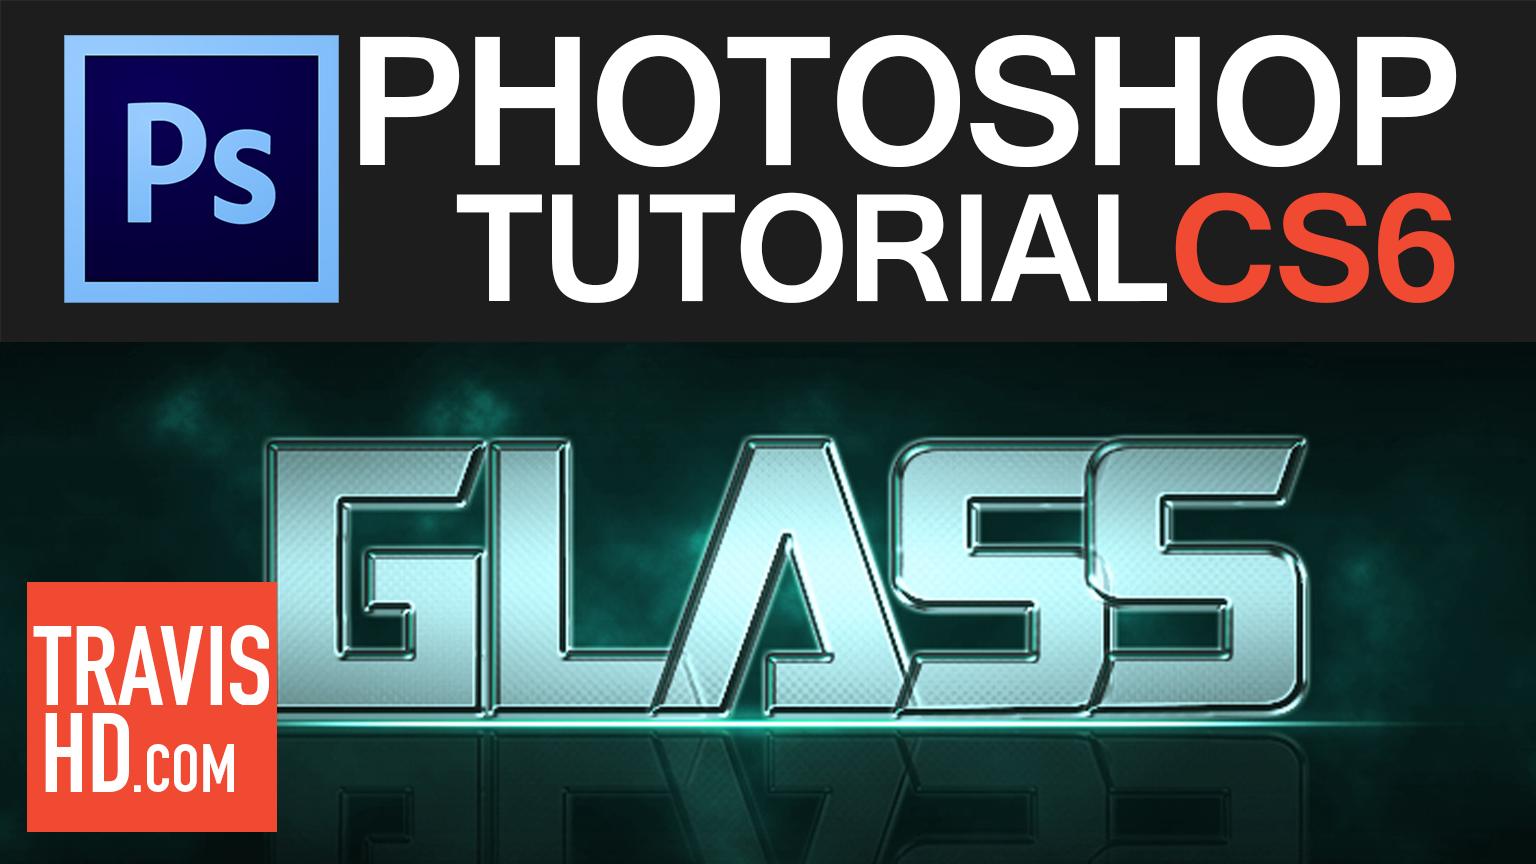 Photoshop Tutorial Video Glass Text by ShindaTravis